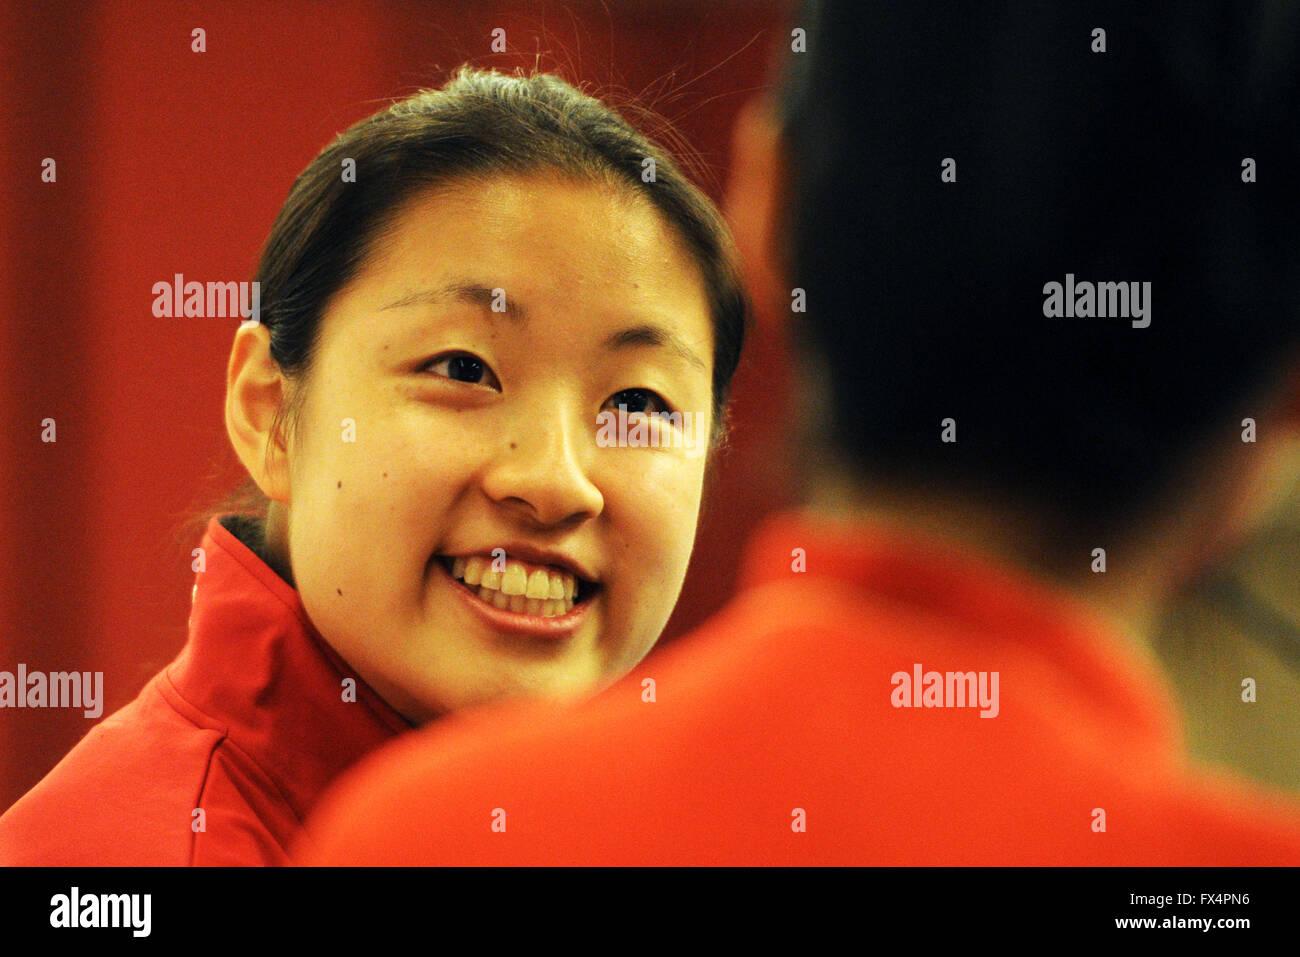 Singapore 11th Apr 2016 Japan s badminton player Nozomi Okuhara